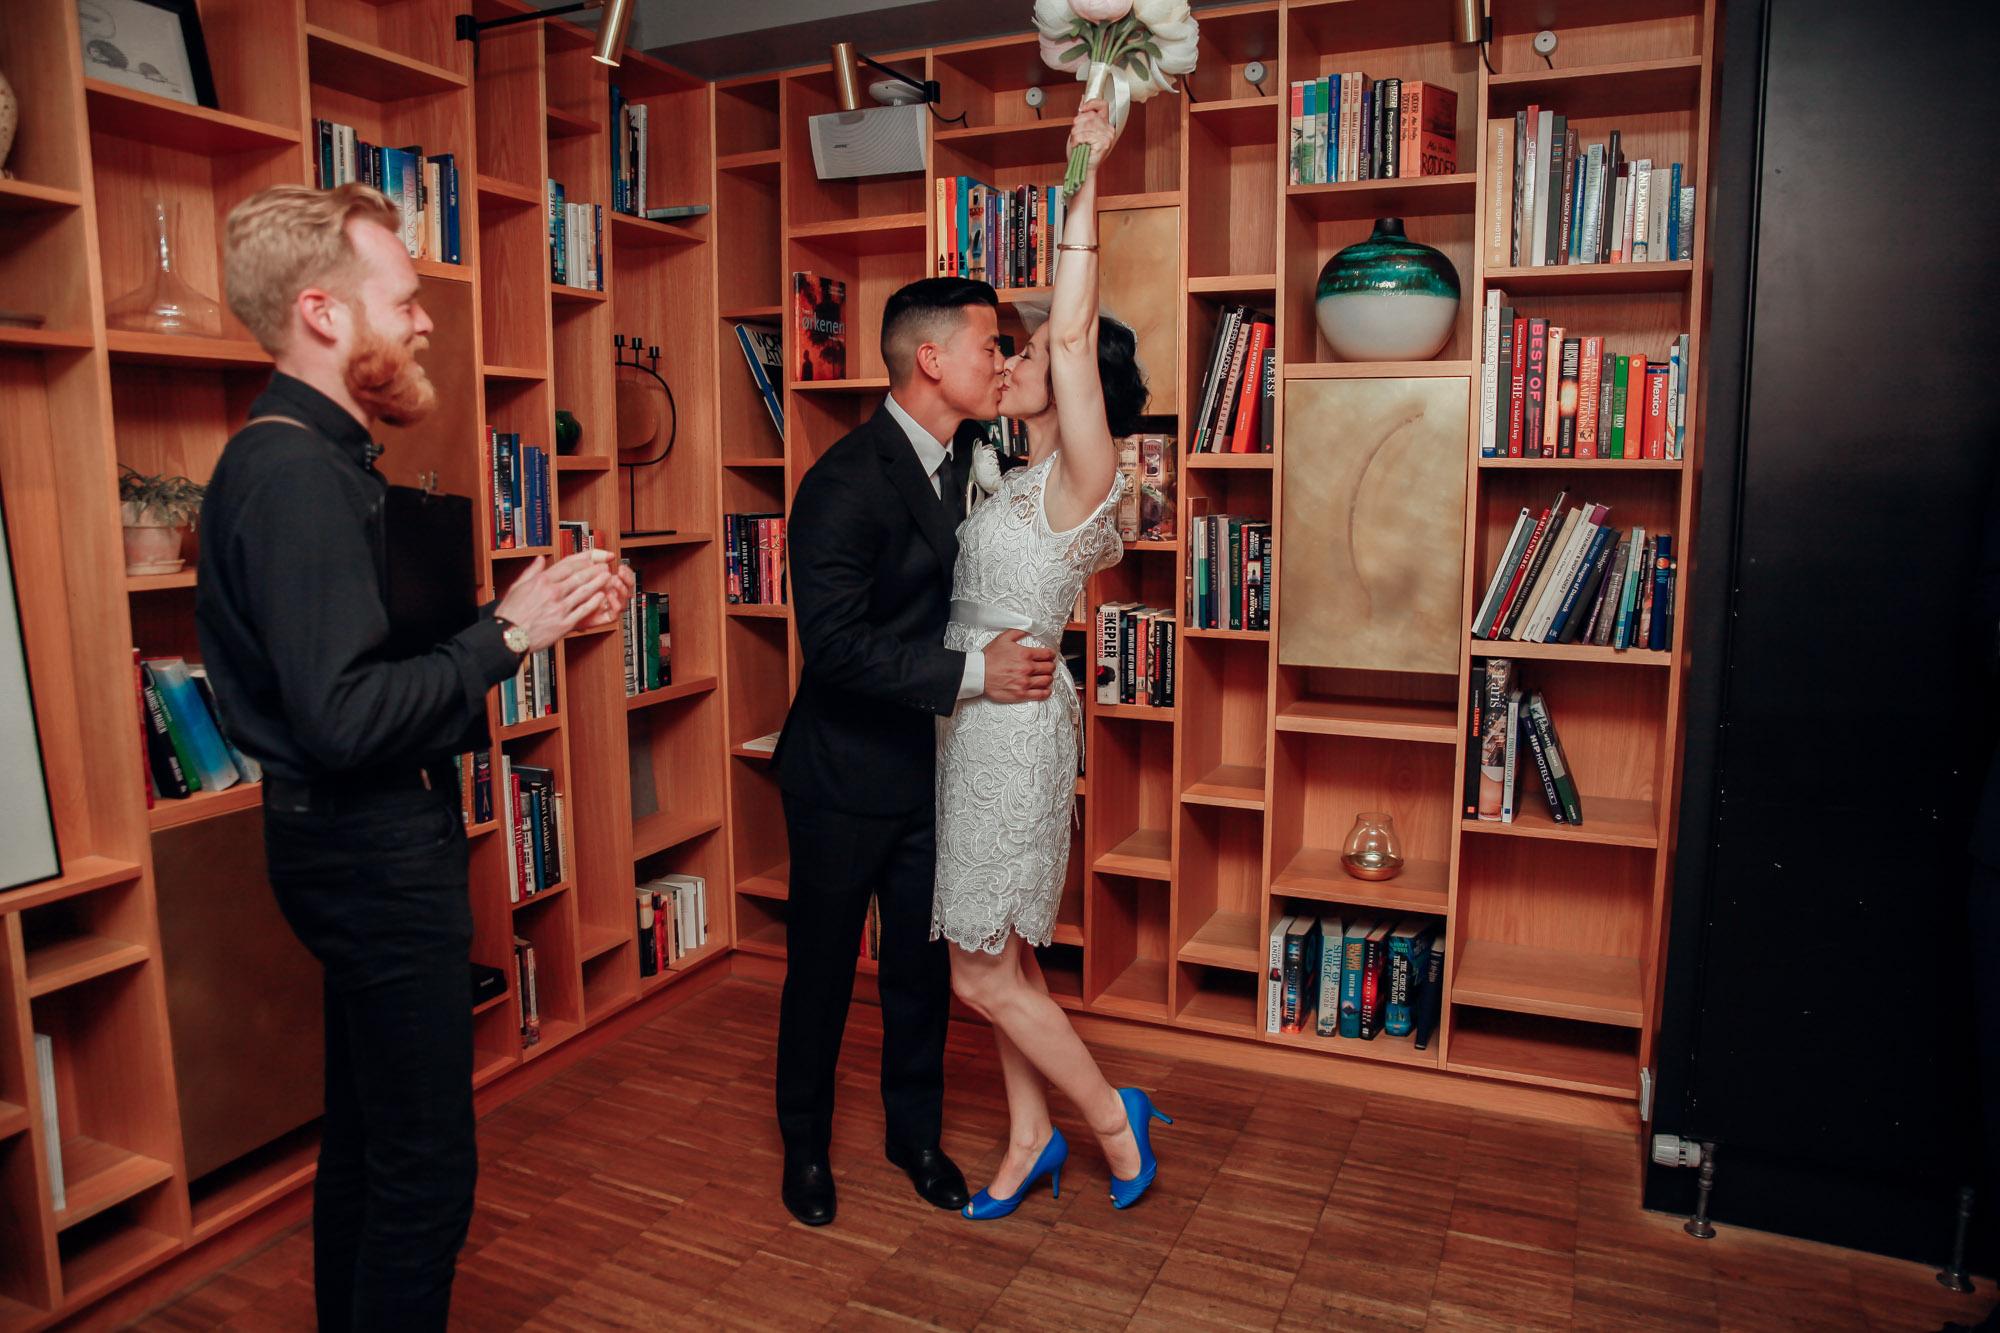 Copenhagen wedding photographer, City Hall wedding  (38 of 43)